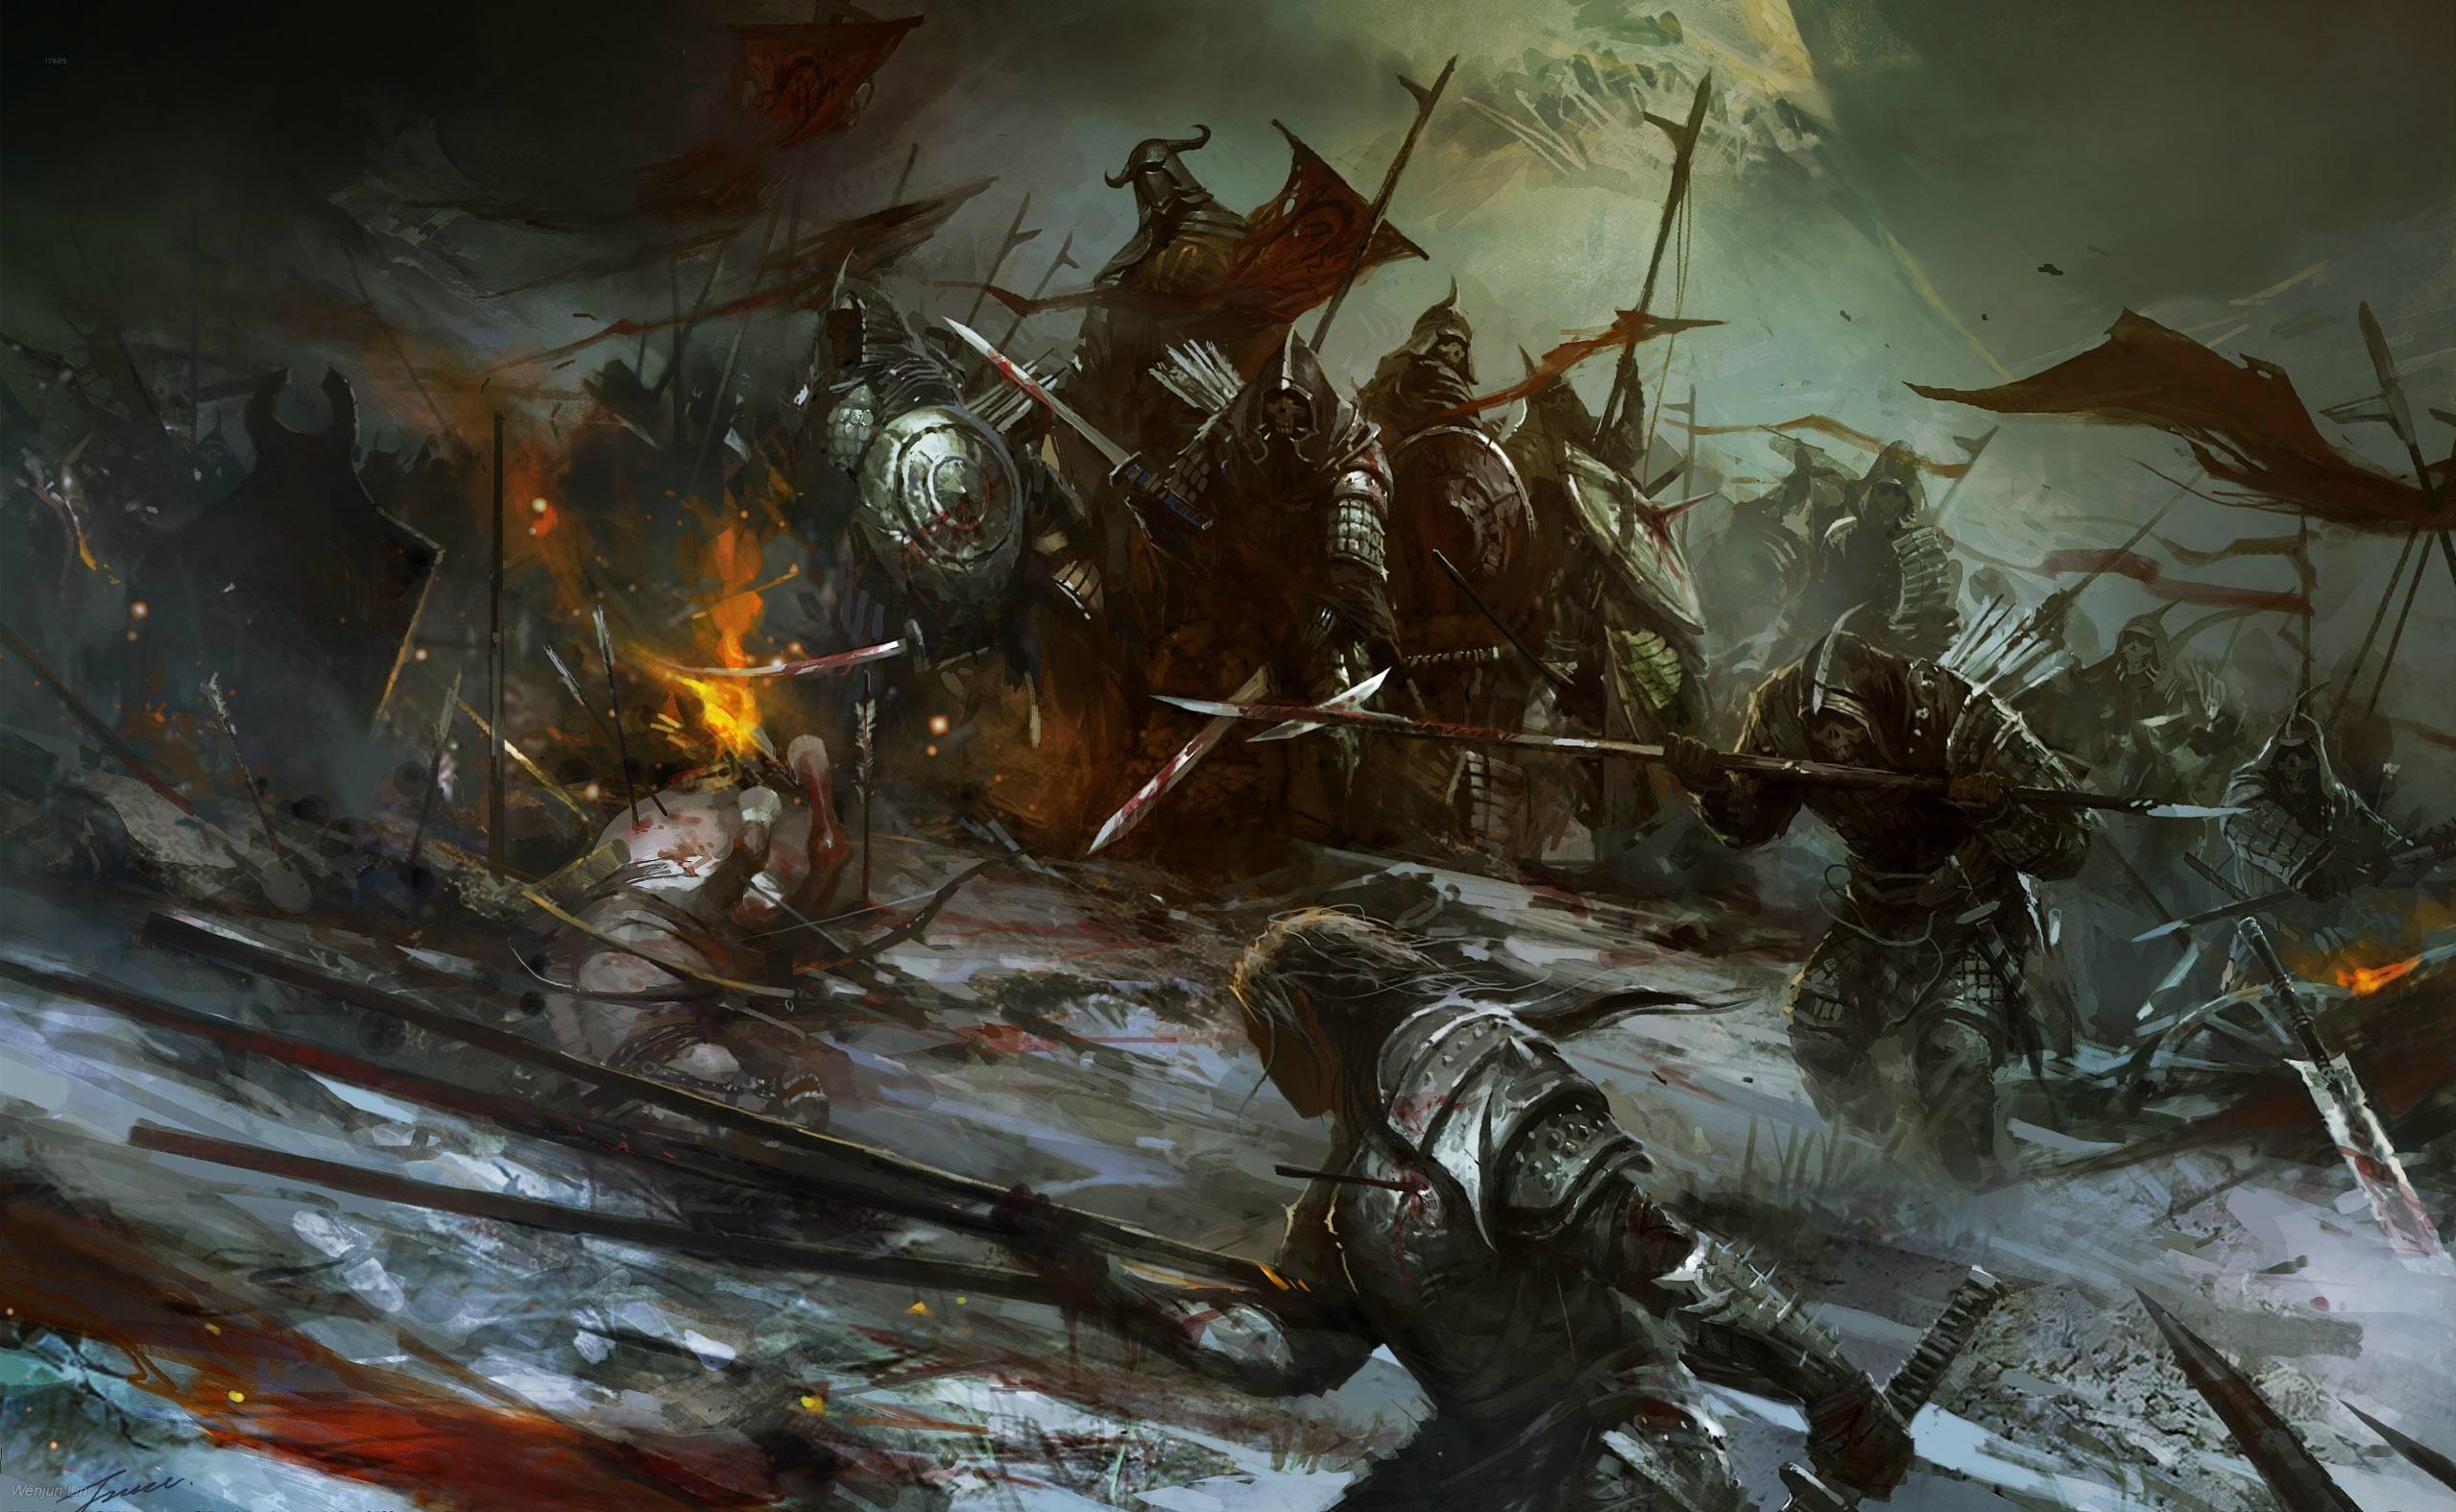 Fantasy war landscape - photo#24